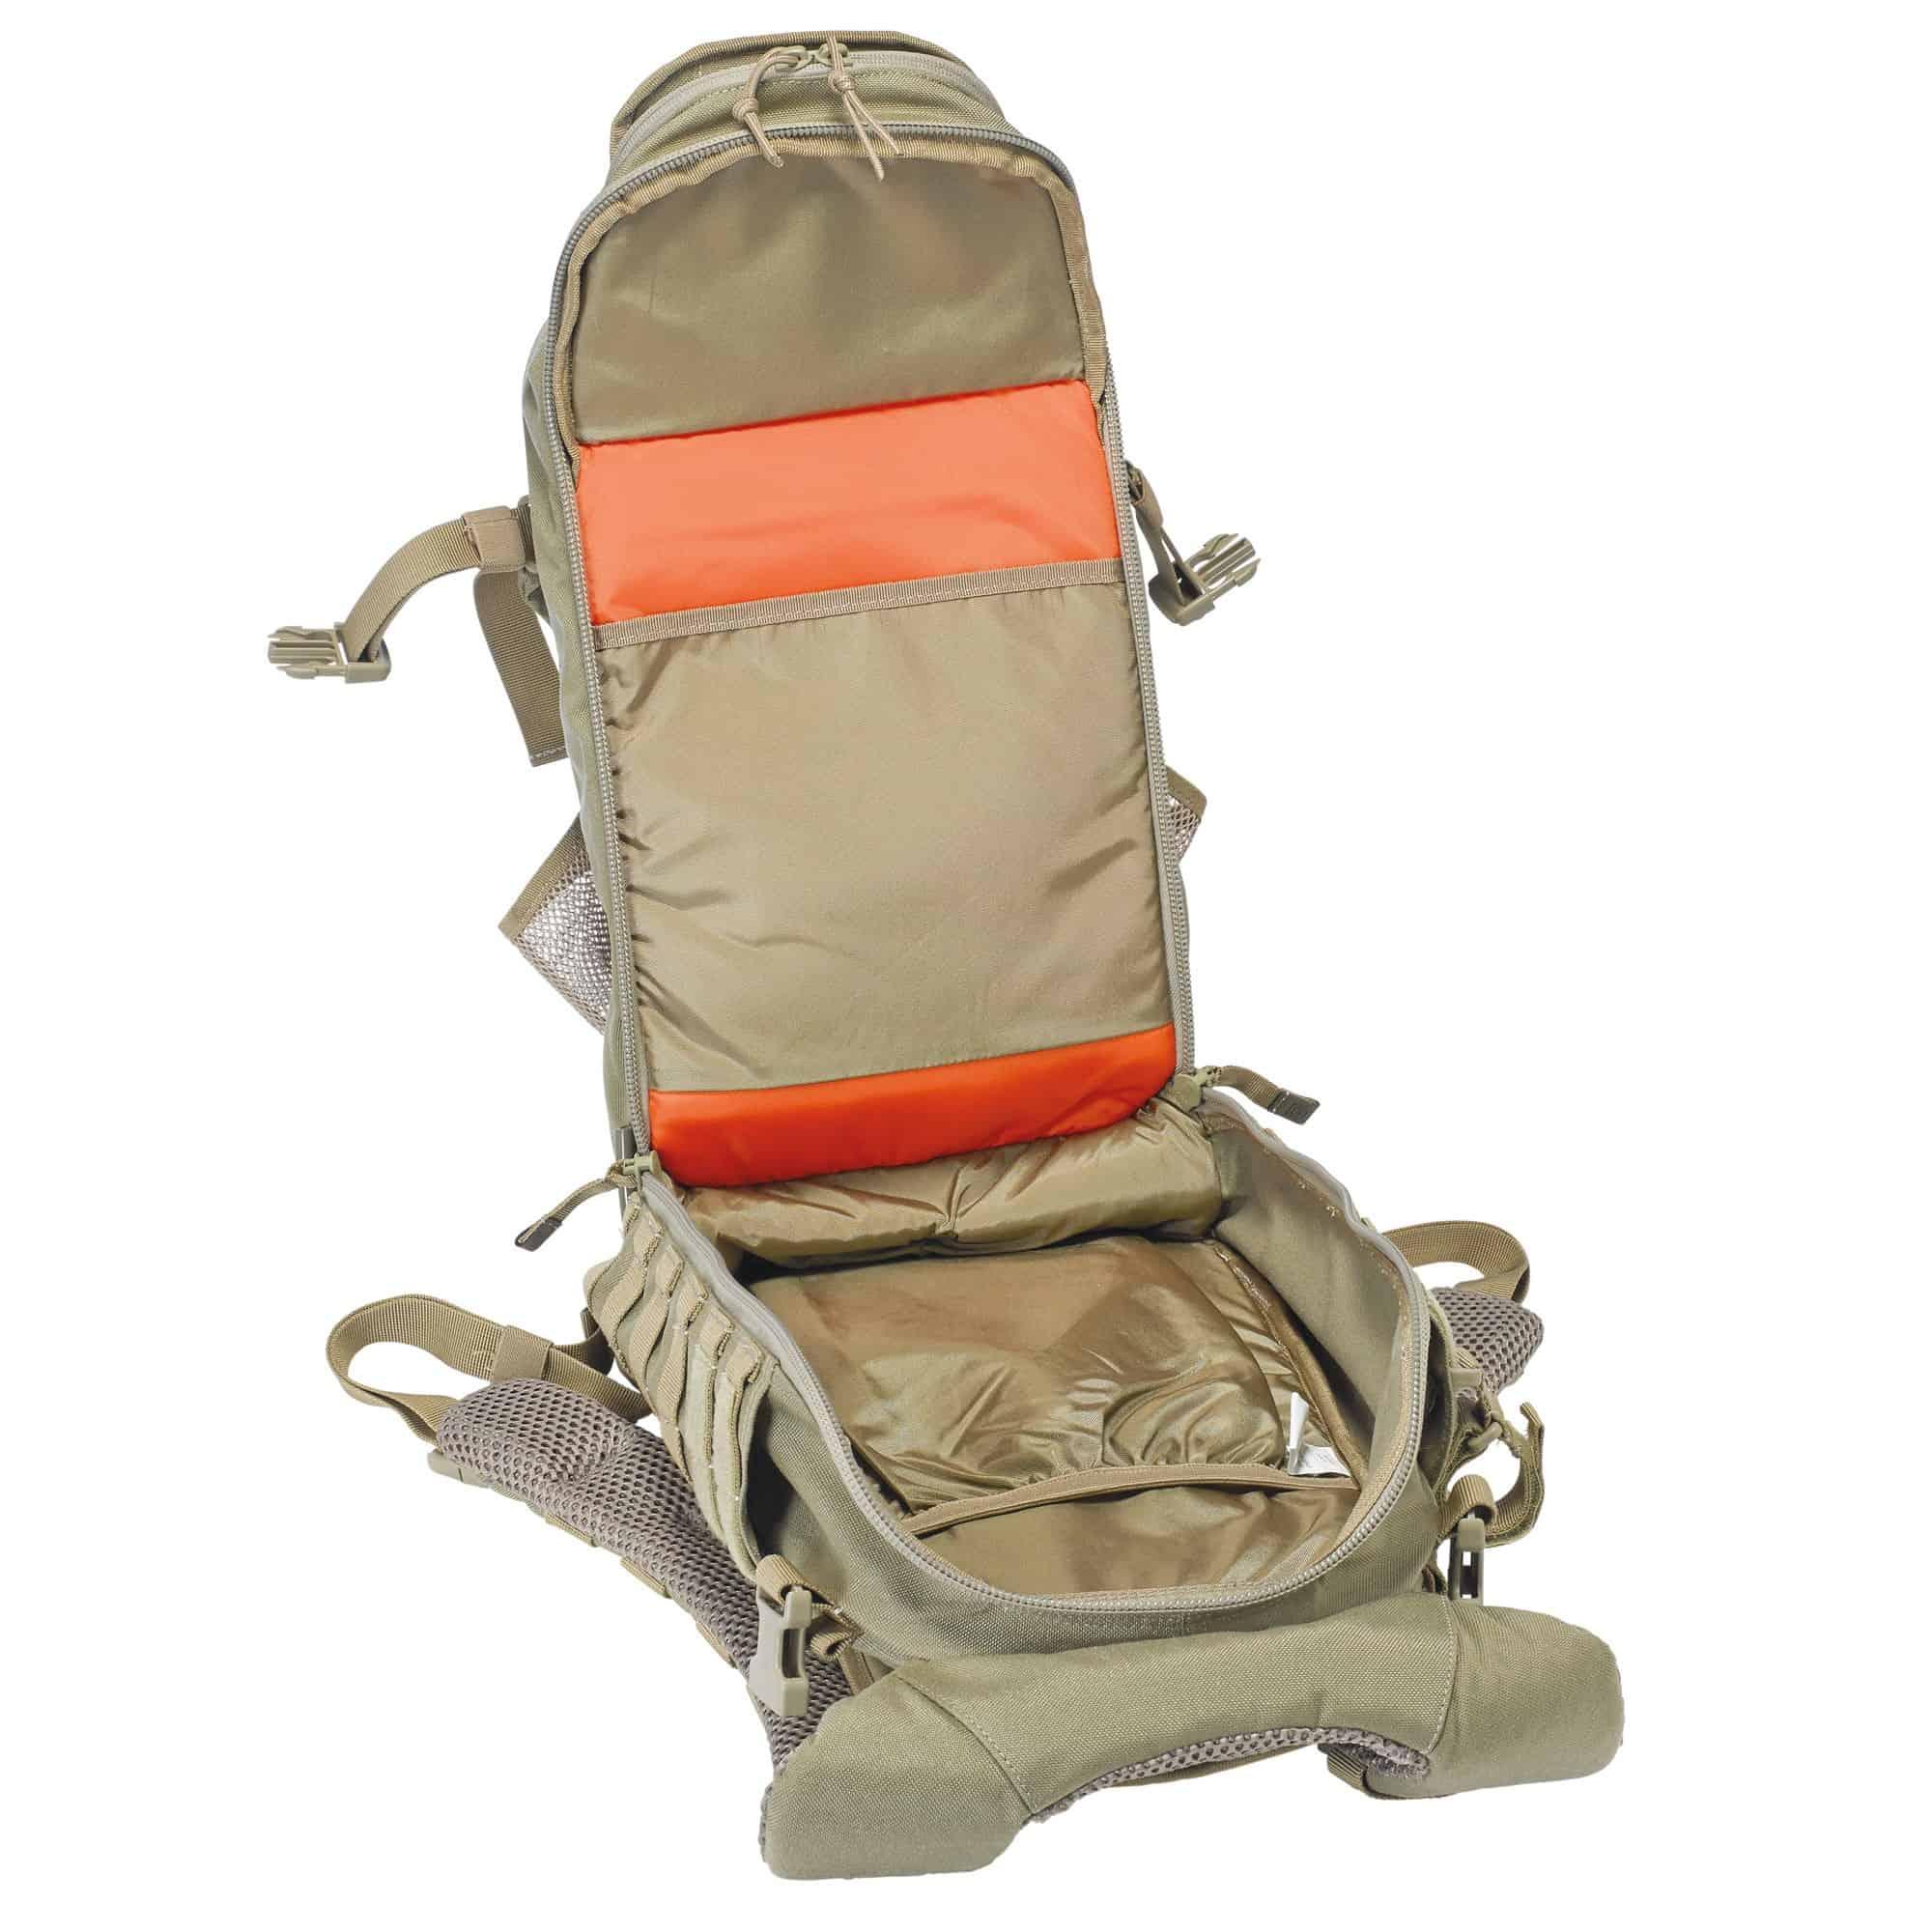 5 11 tactical all hazards nitro backpack doomsday prep